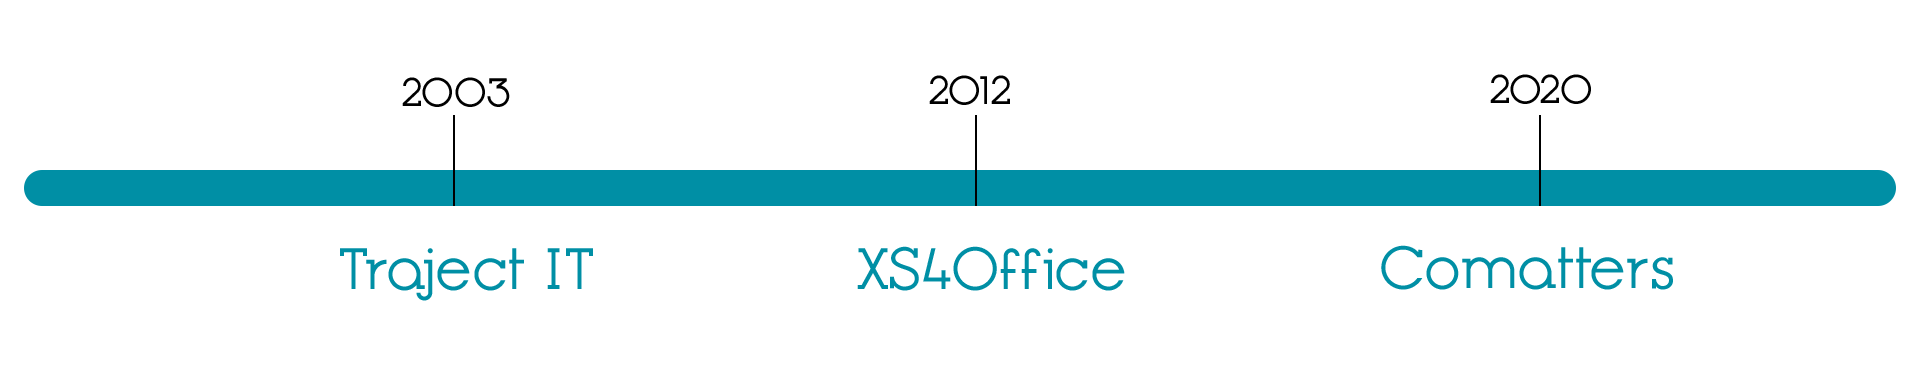 timeline van Traject IT en XS4Office naar Comatters